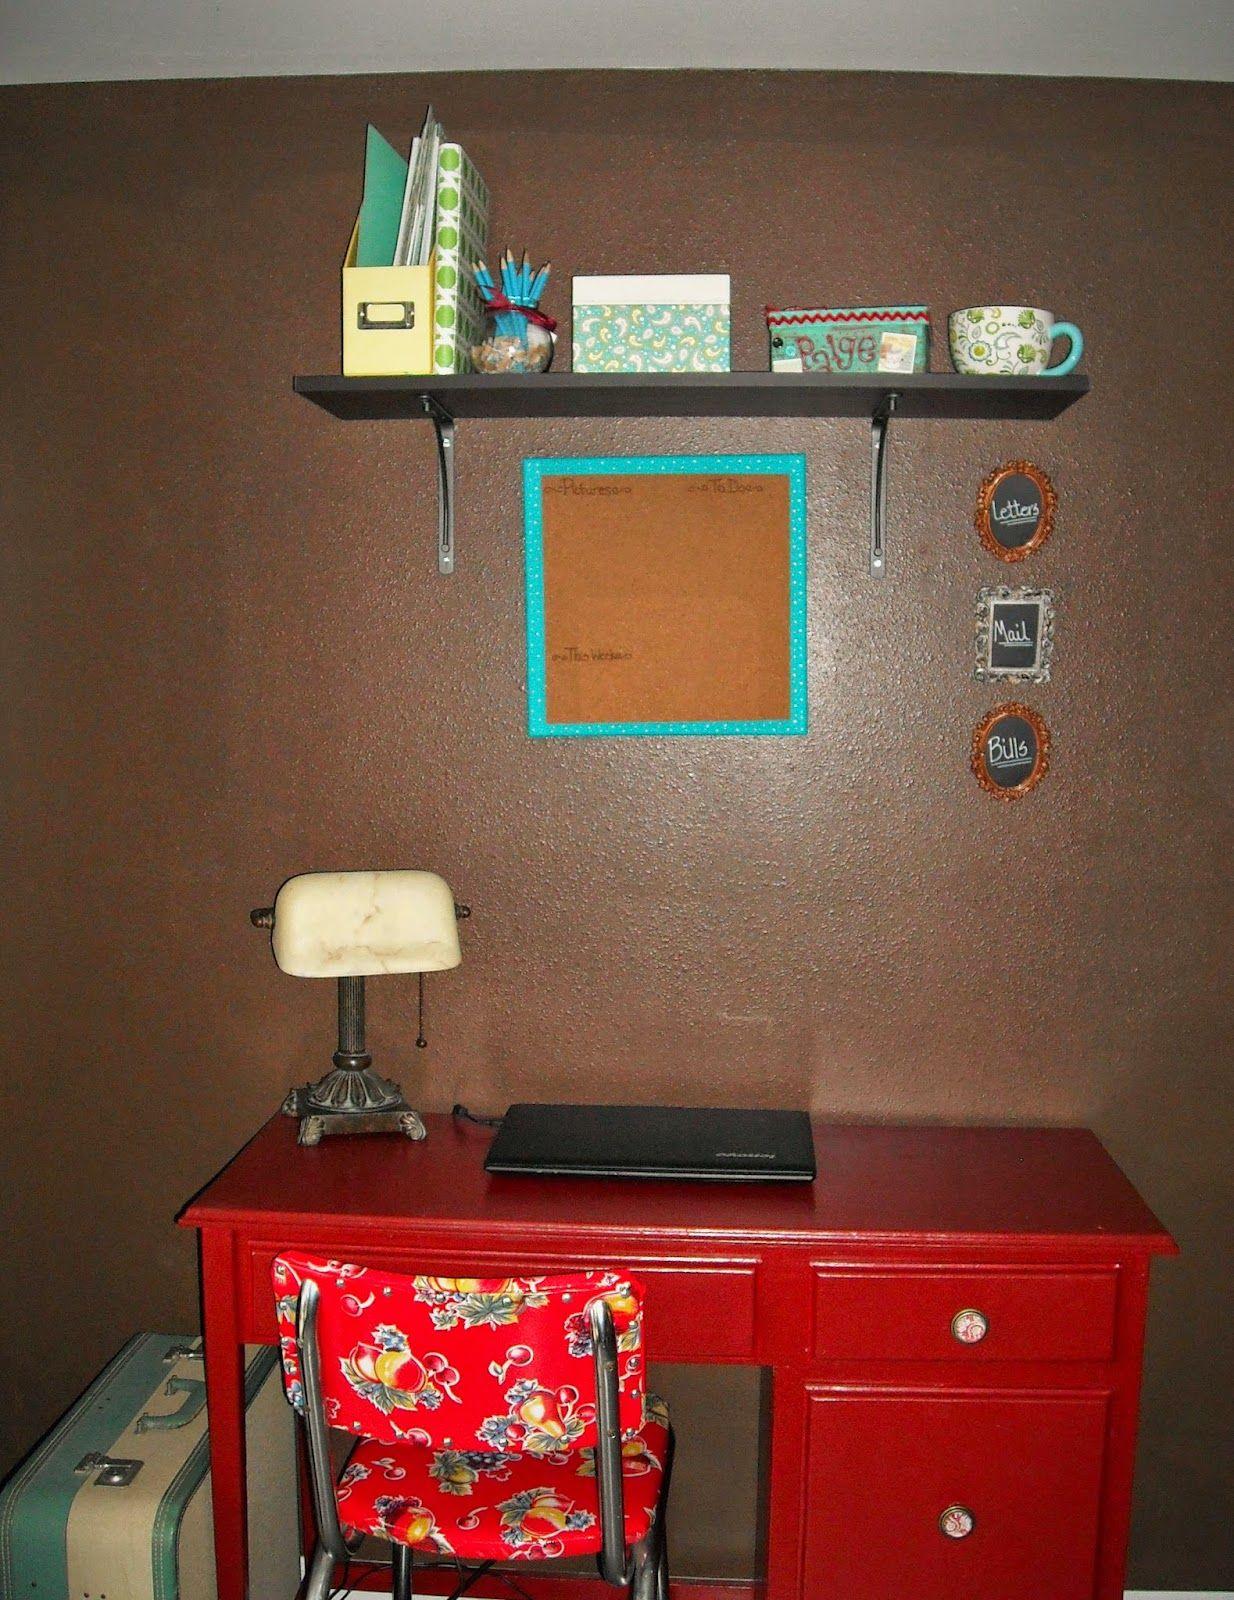 Best 25 painted bulletin boards ideas on pinterest for Painted cork board ideas